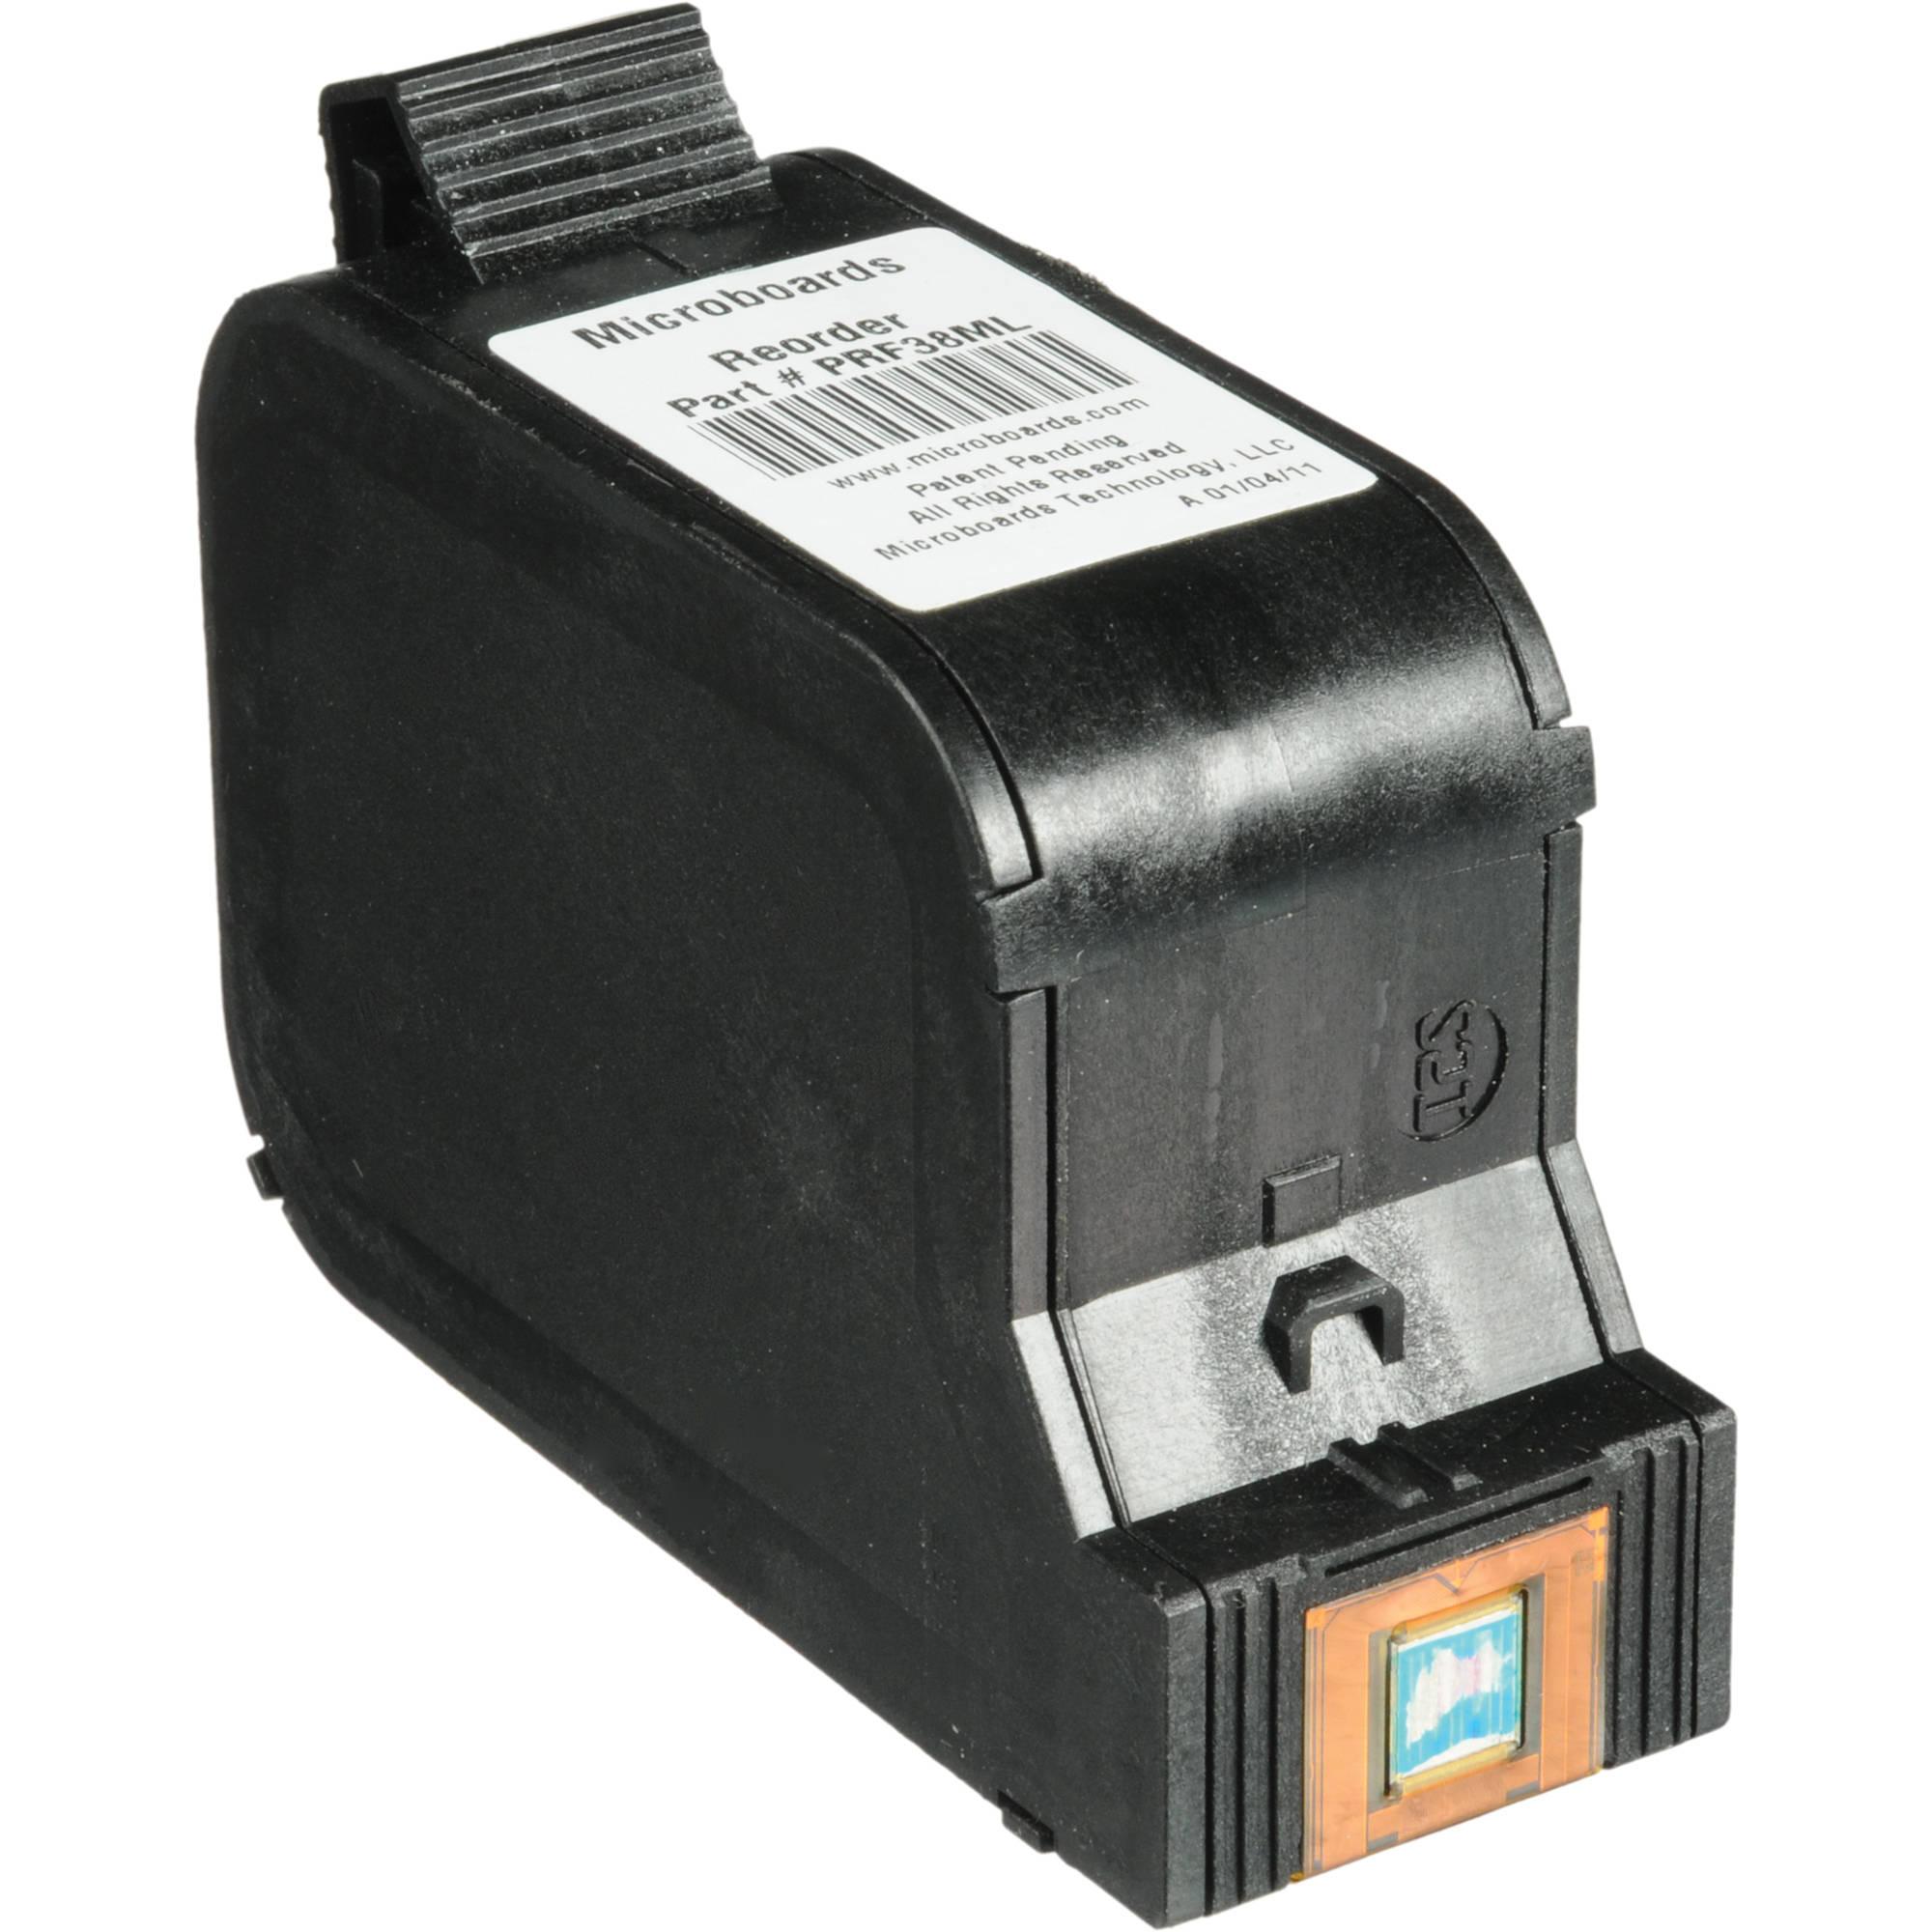 MICROBOARDS DX-2 DISC PUBLISHER DRIVER WINDOWS